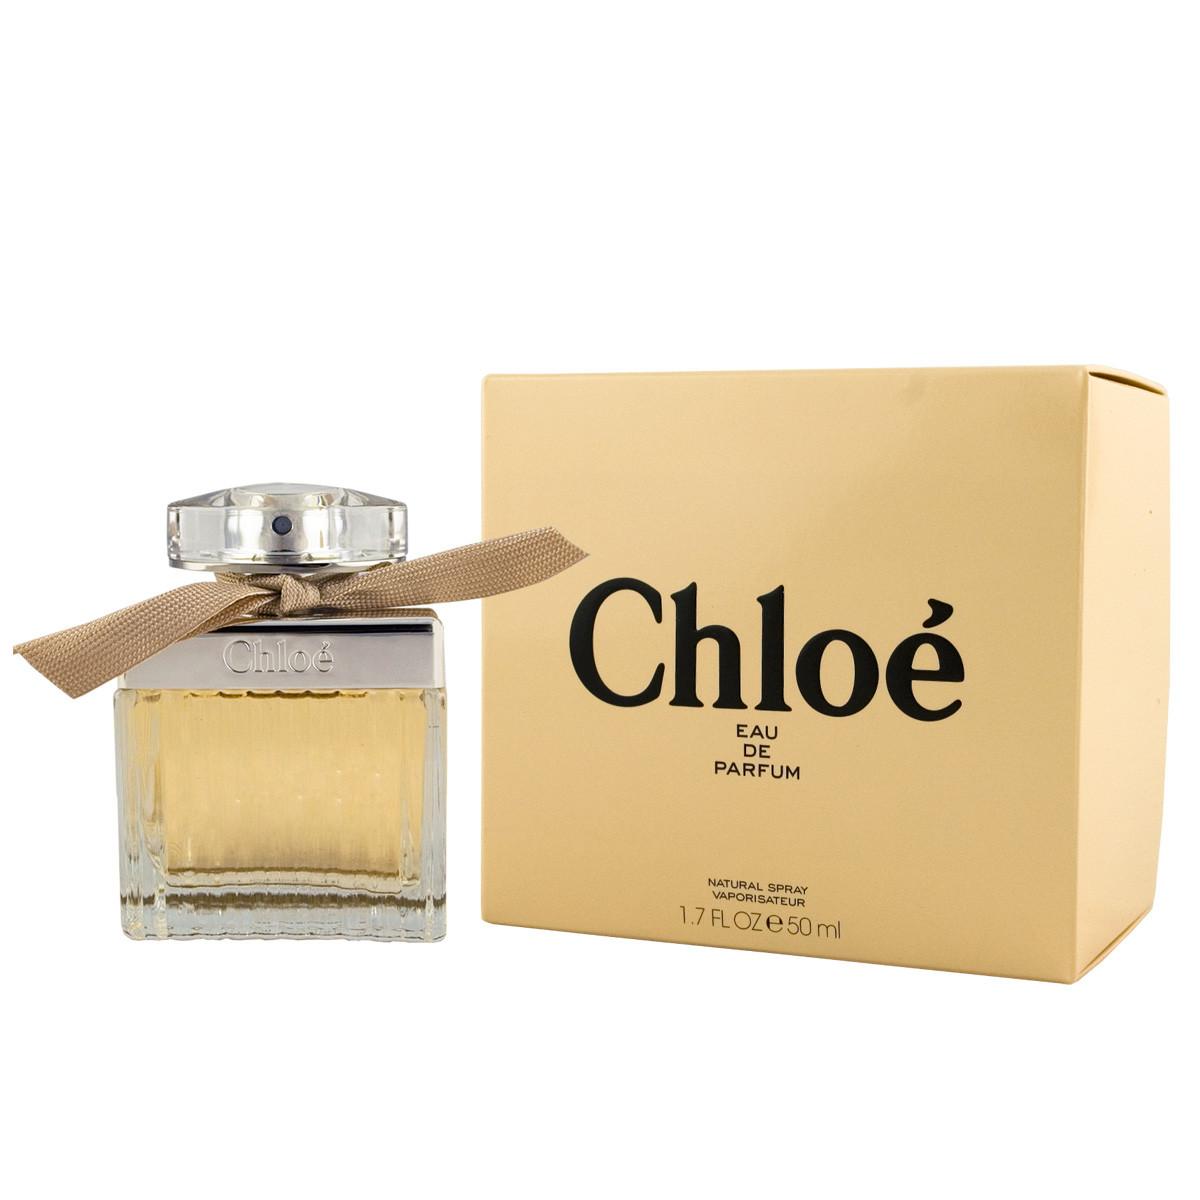 chloe chloe eau de parfum 50 ml woman chlo eau de. Black Bedroom Furniture Sets. Home Design Ideas